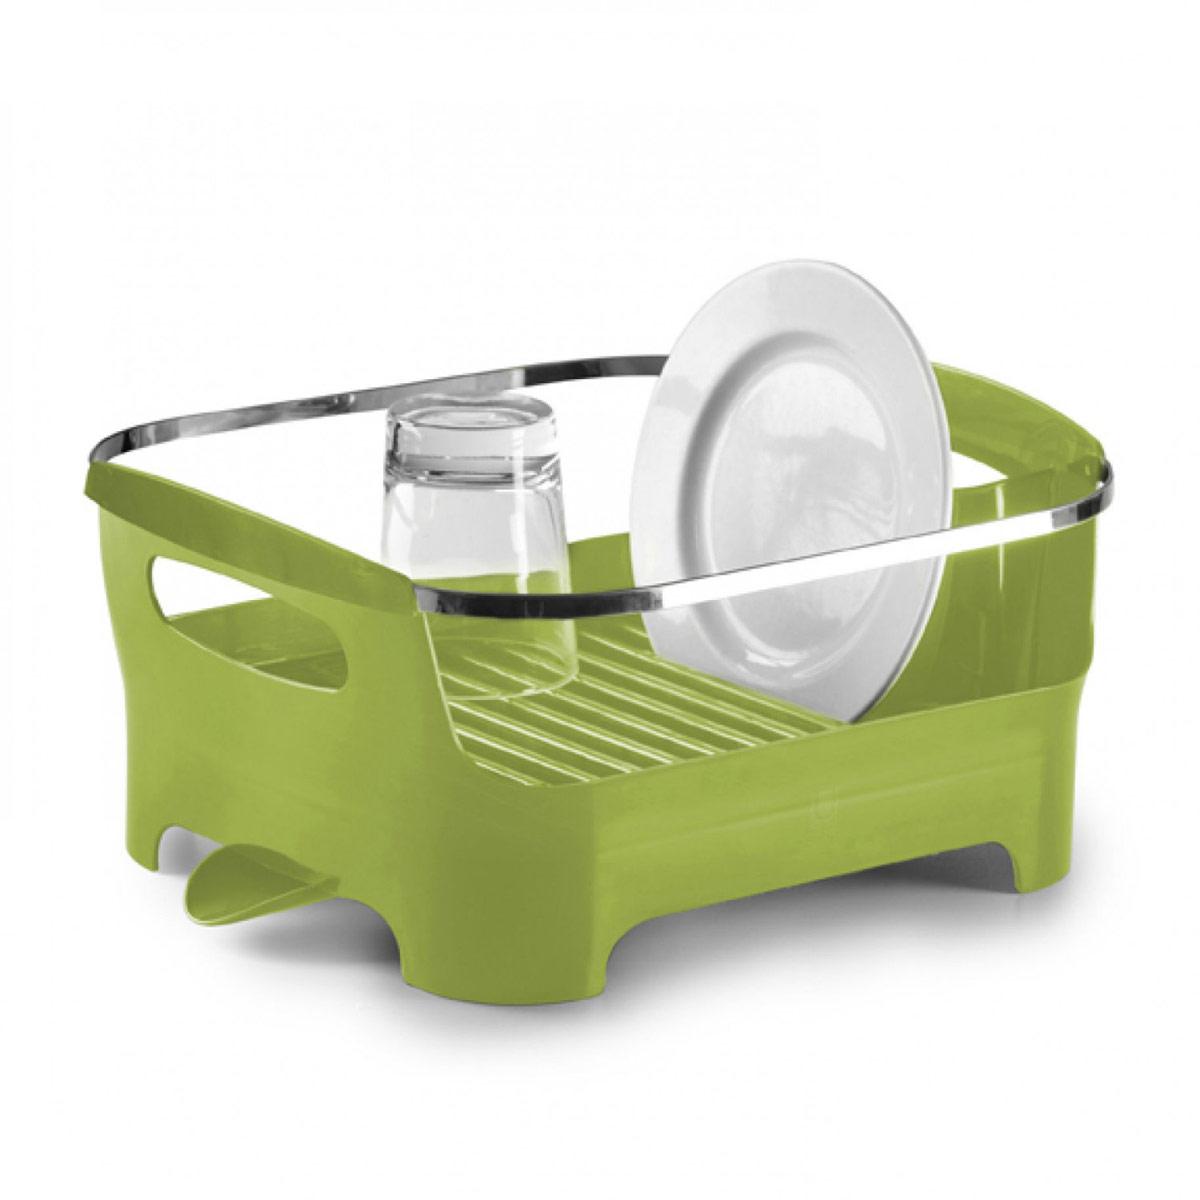 "Сушилка для посуды Umbra ""Basin"", цвет: зеленый, 38 см х 33 см х 17 см"